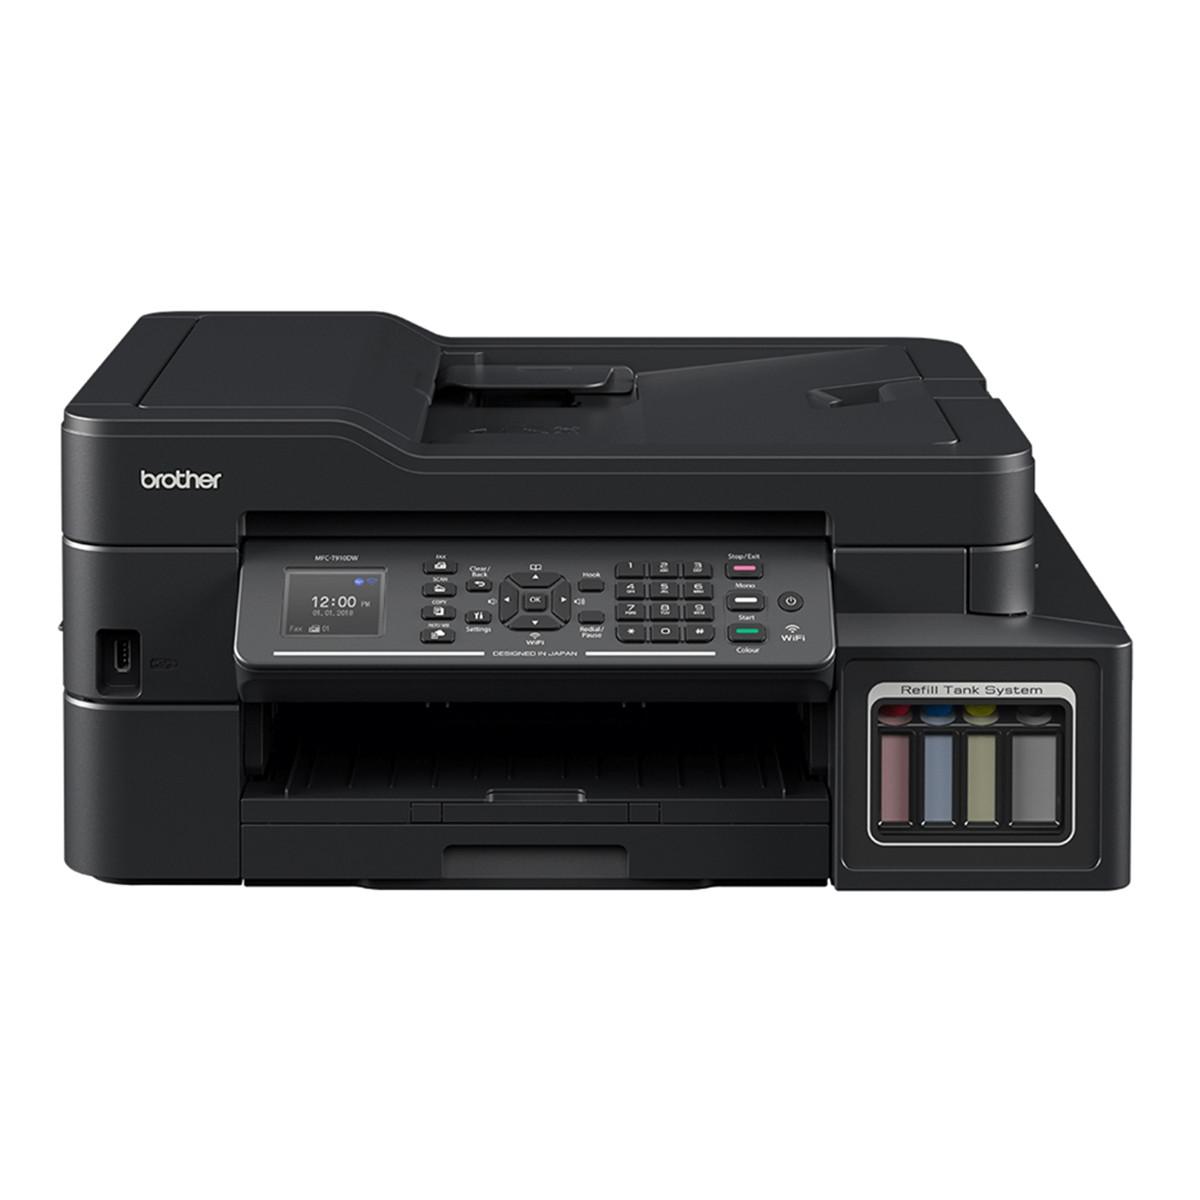 Impressora Brother MFC-T910DW Multifuncional Tanque de Tinta Colorida com Wireless e ADF